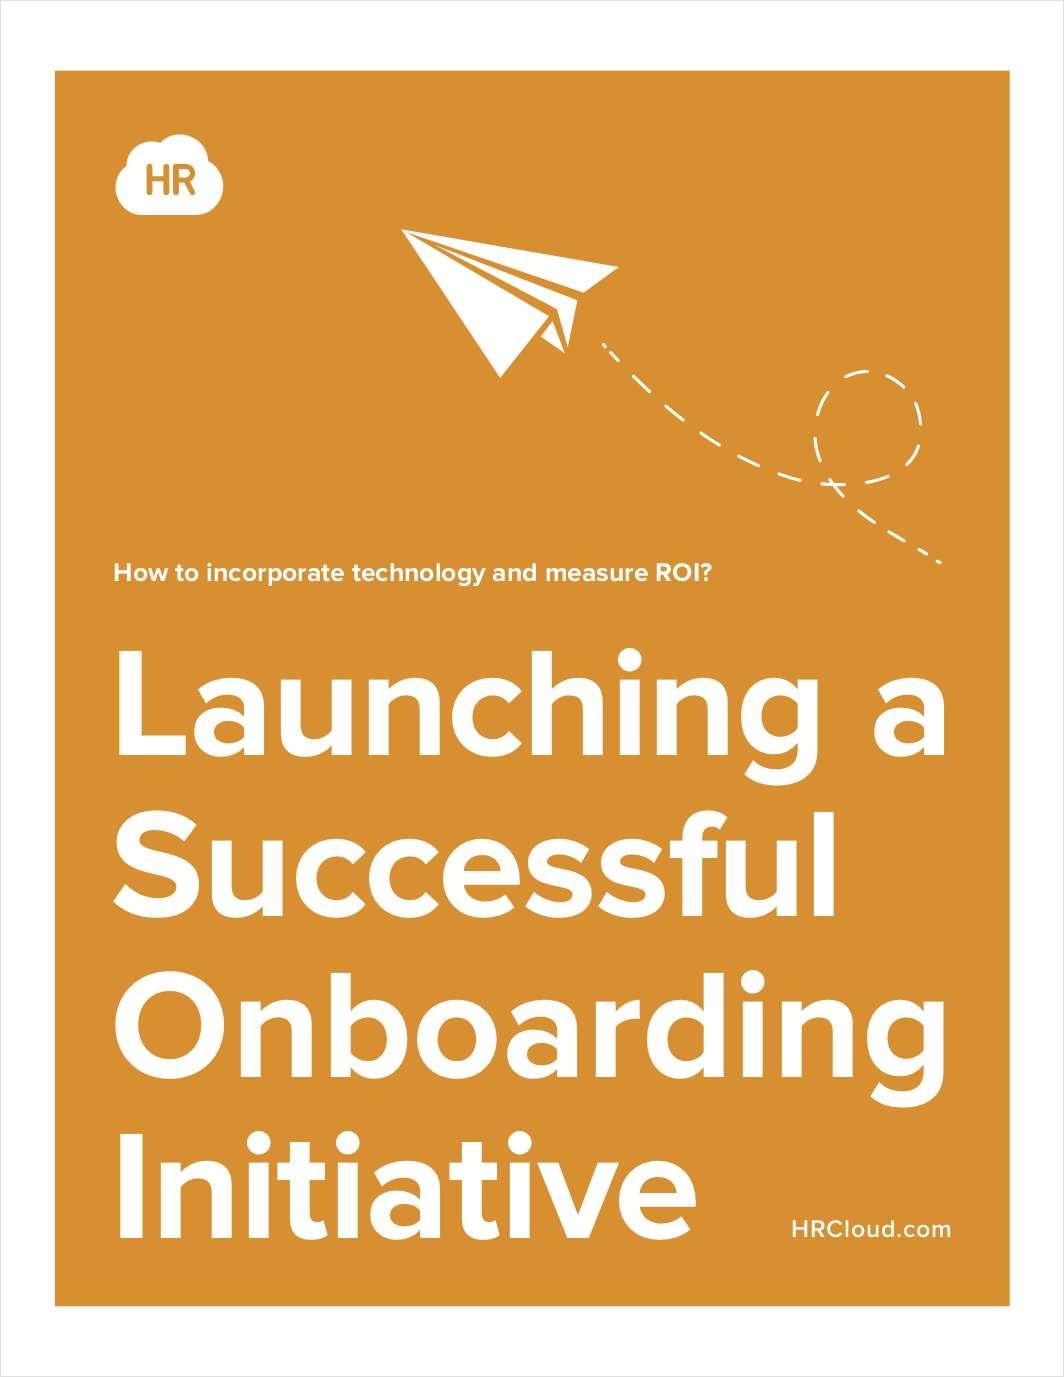 Launching a Successful Onboarding Initiative